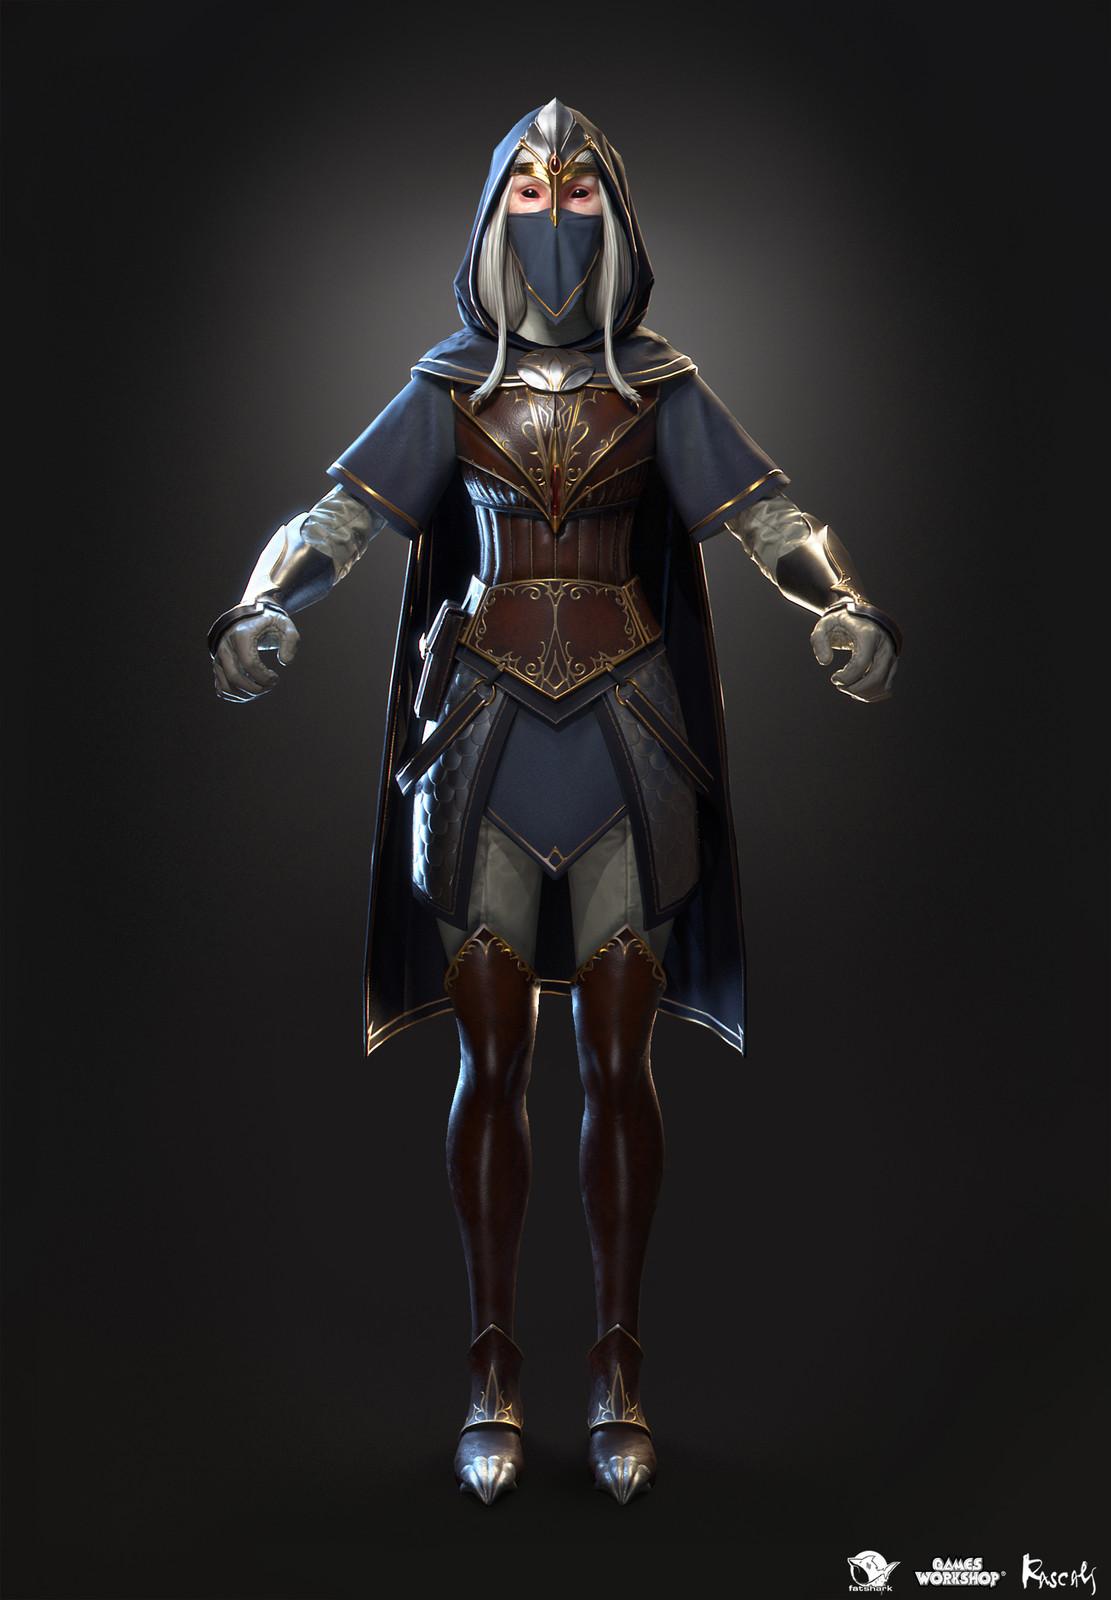 Kerillian: Handmaiden is one of the playable hero variants Rascals made for Warhammer: Vermintide II, Fatshark's award-winning co-op meelee action published by Games Workshop.